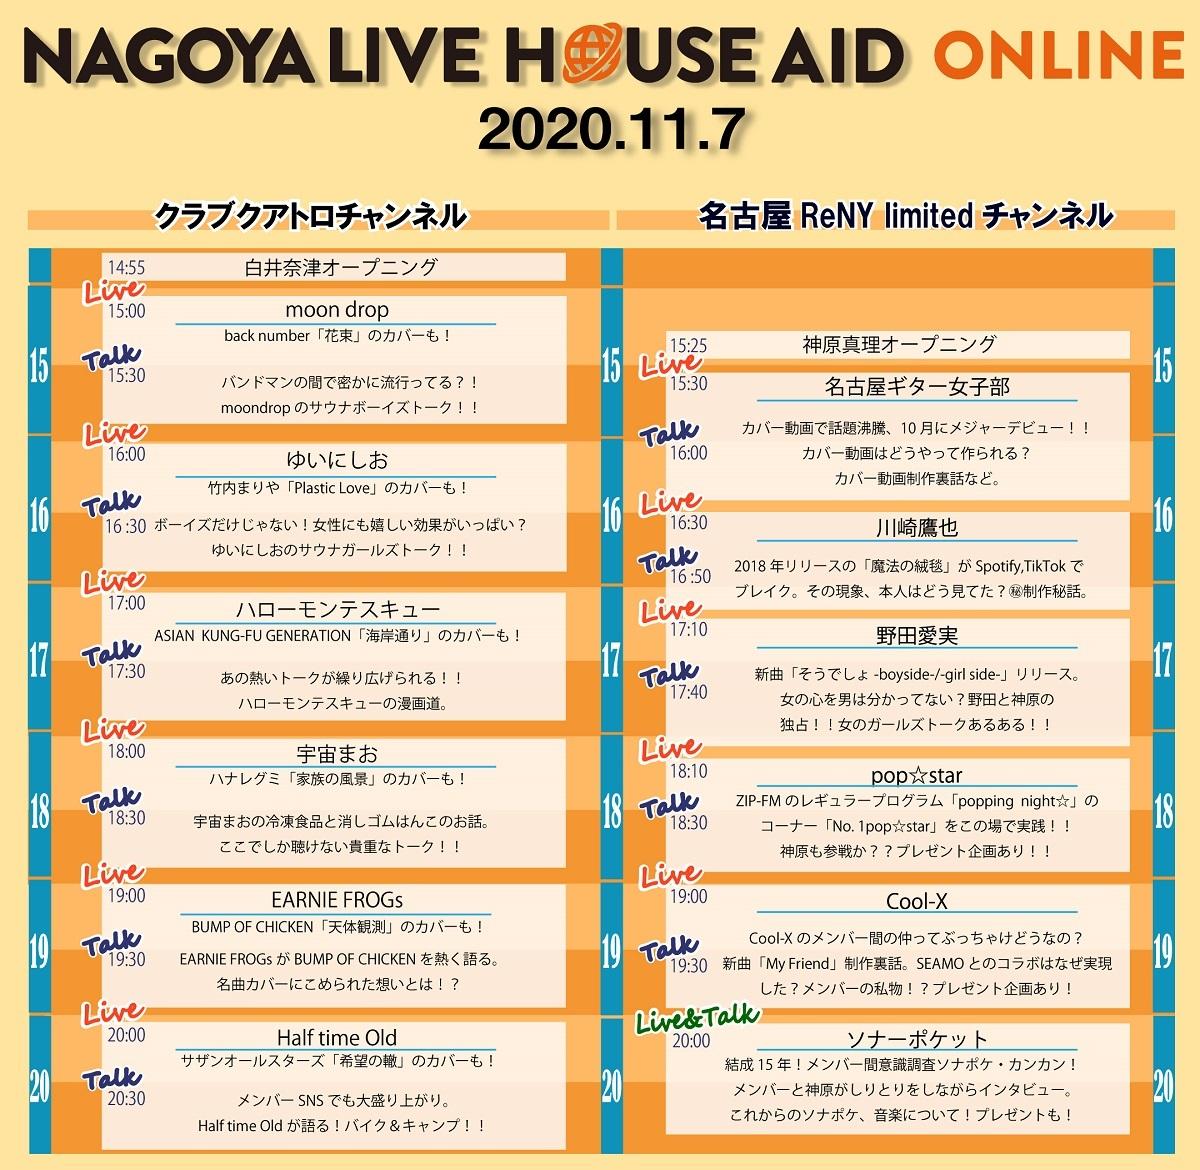 NAGOYA LIVE HOUSE AID -online- タイムテーブル